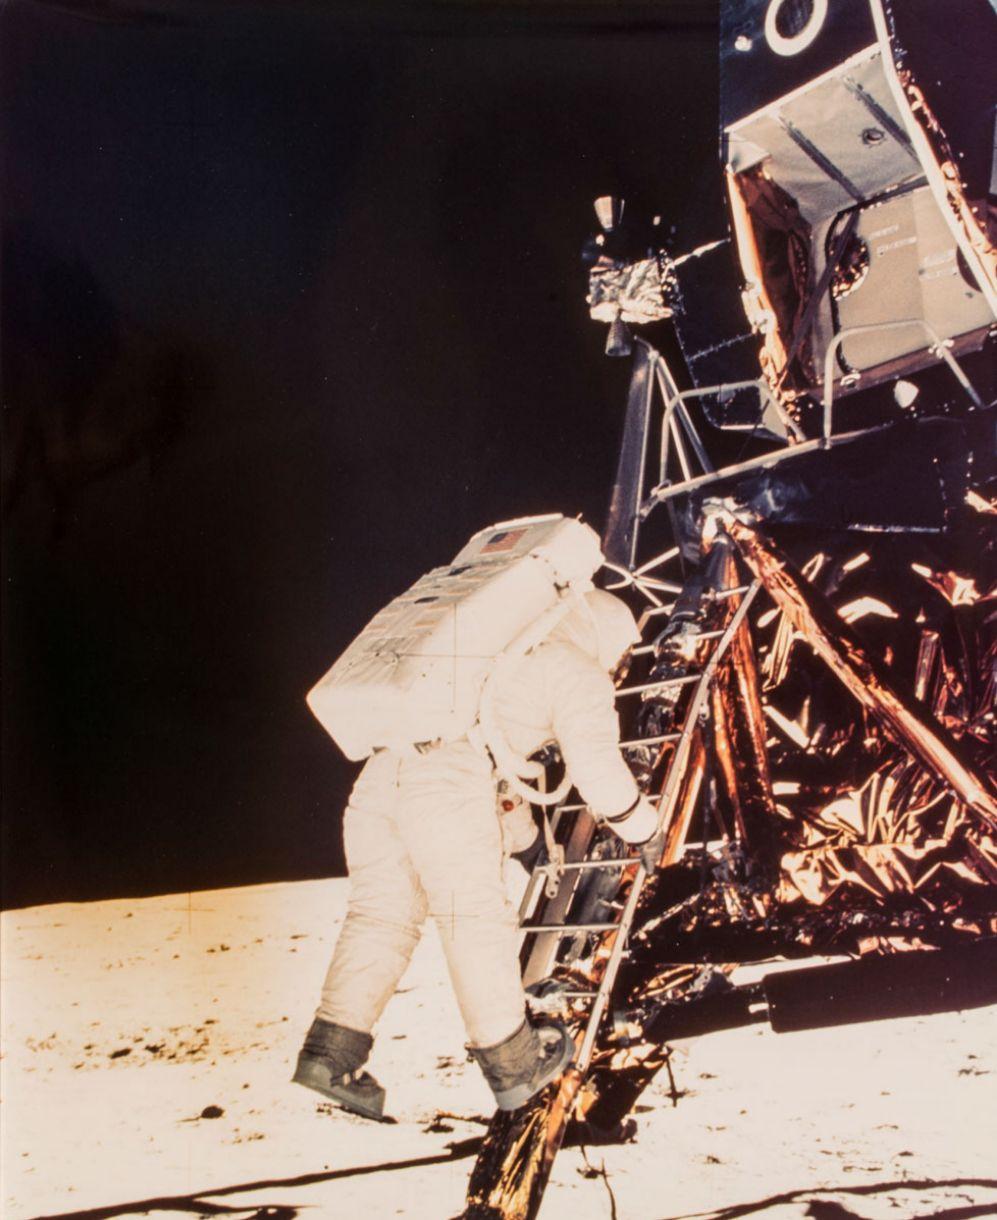 Buzz Aldrin a punto de dar su primer paso en la Luna, 1969.Imagen captada por Neil Armstrong / NASA Fotografía vendida por 3.000 euros.